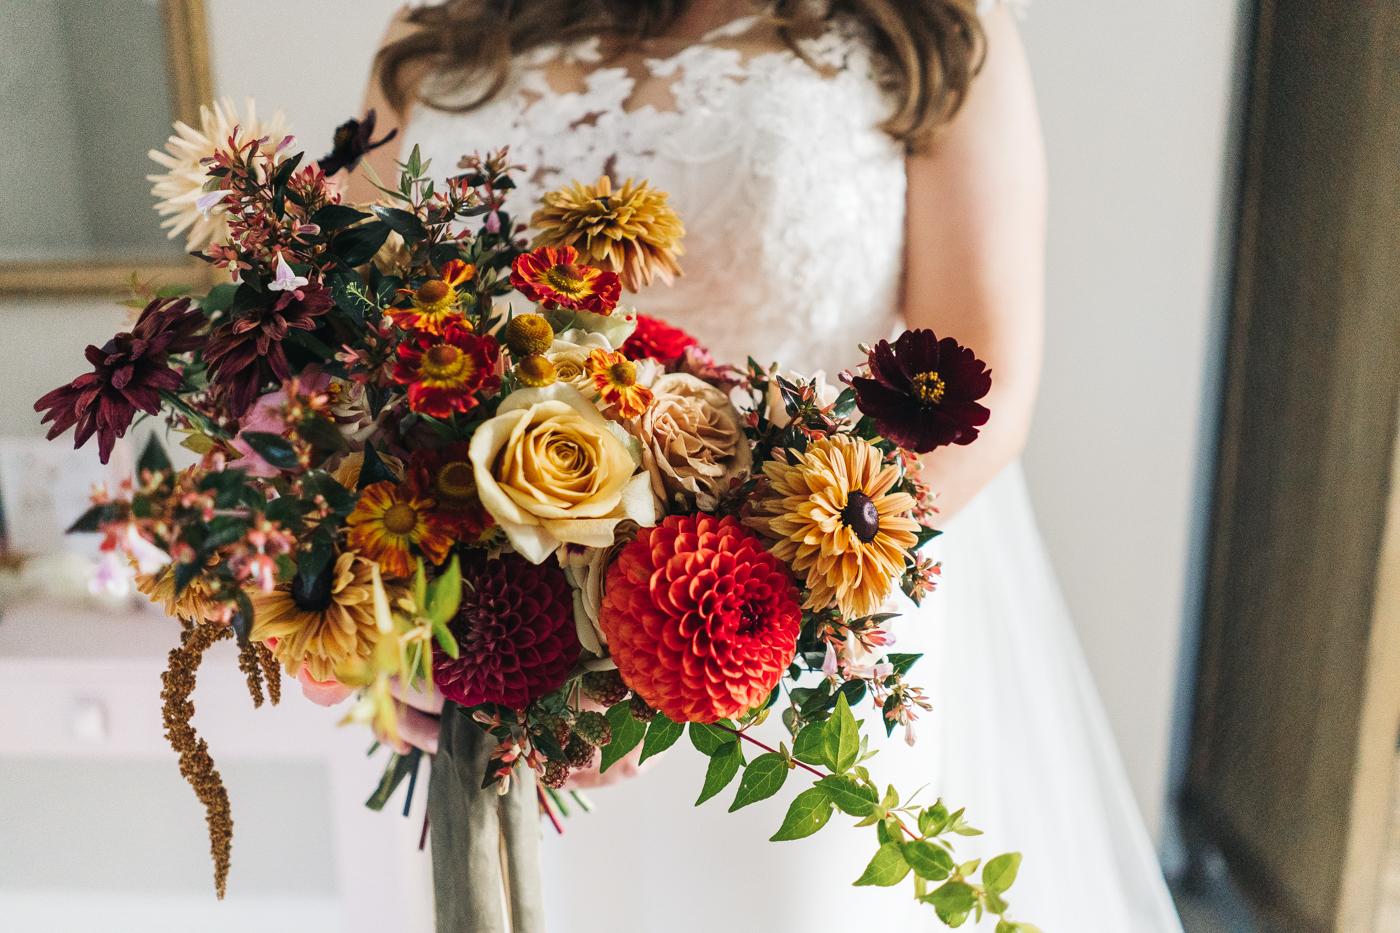 wedding-at-the-pheasant-harome-helmsley-north-yorkshire-wedding-photographer-0005.jpg